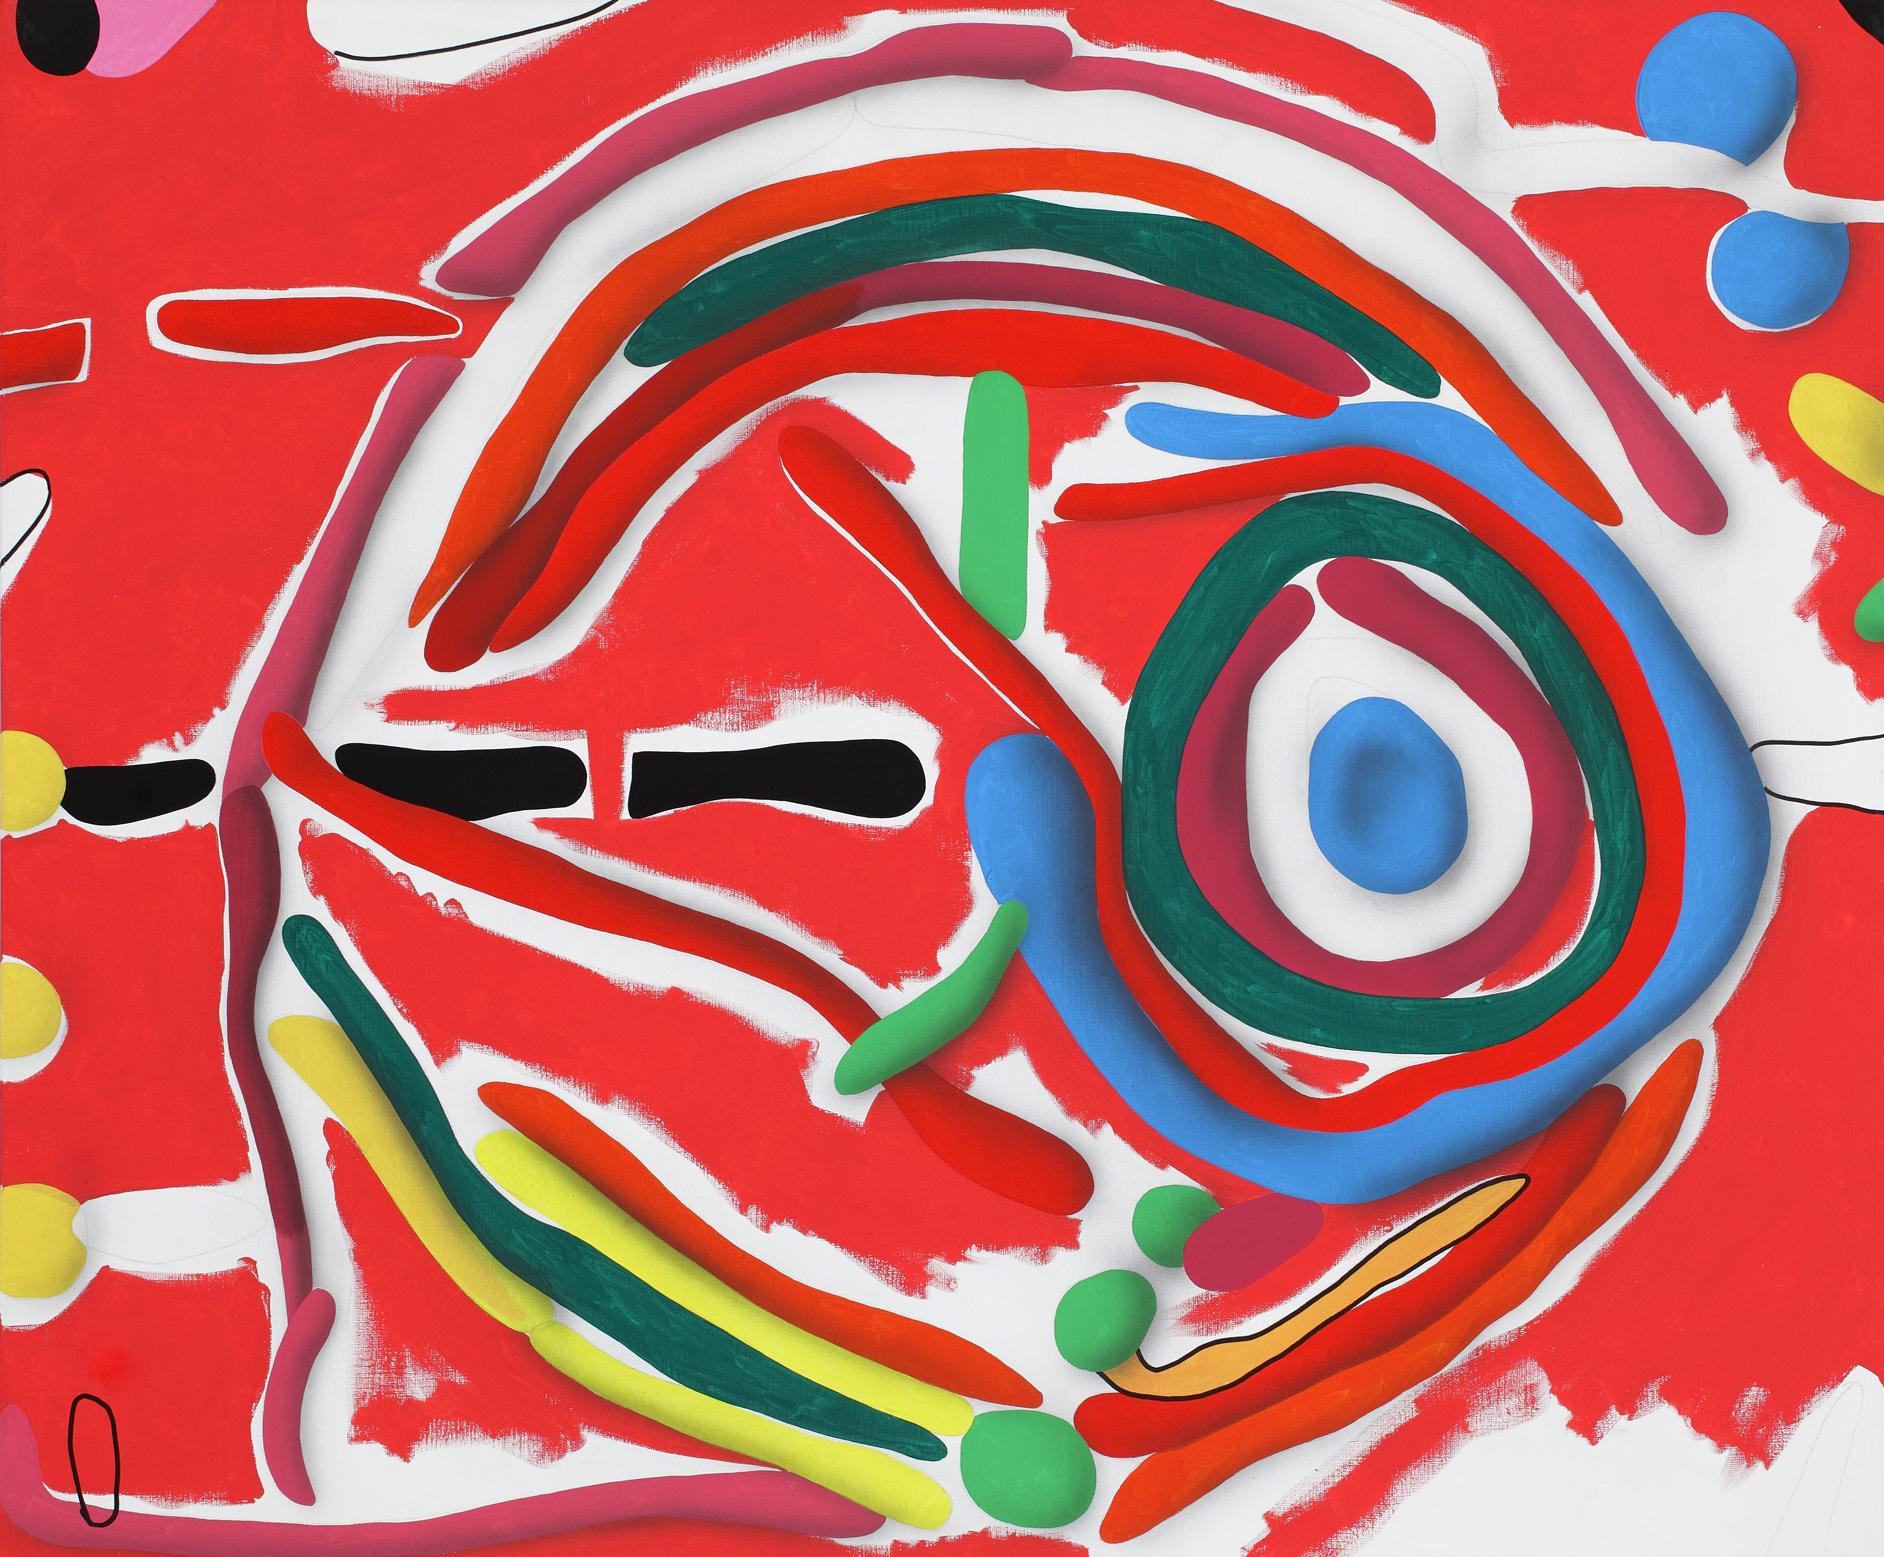 Circle II. 2011, acrylic on canvas, 120 x 140 cm